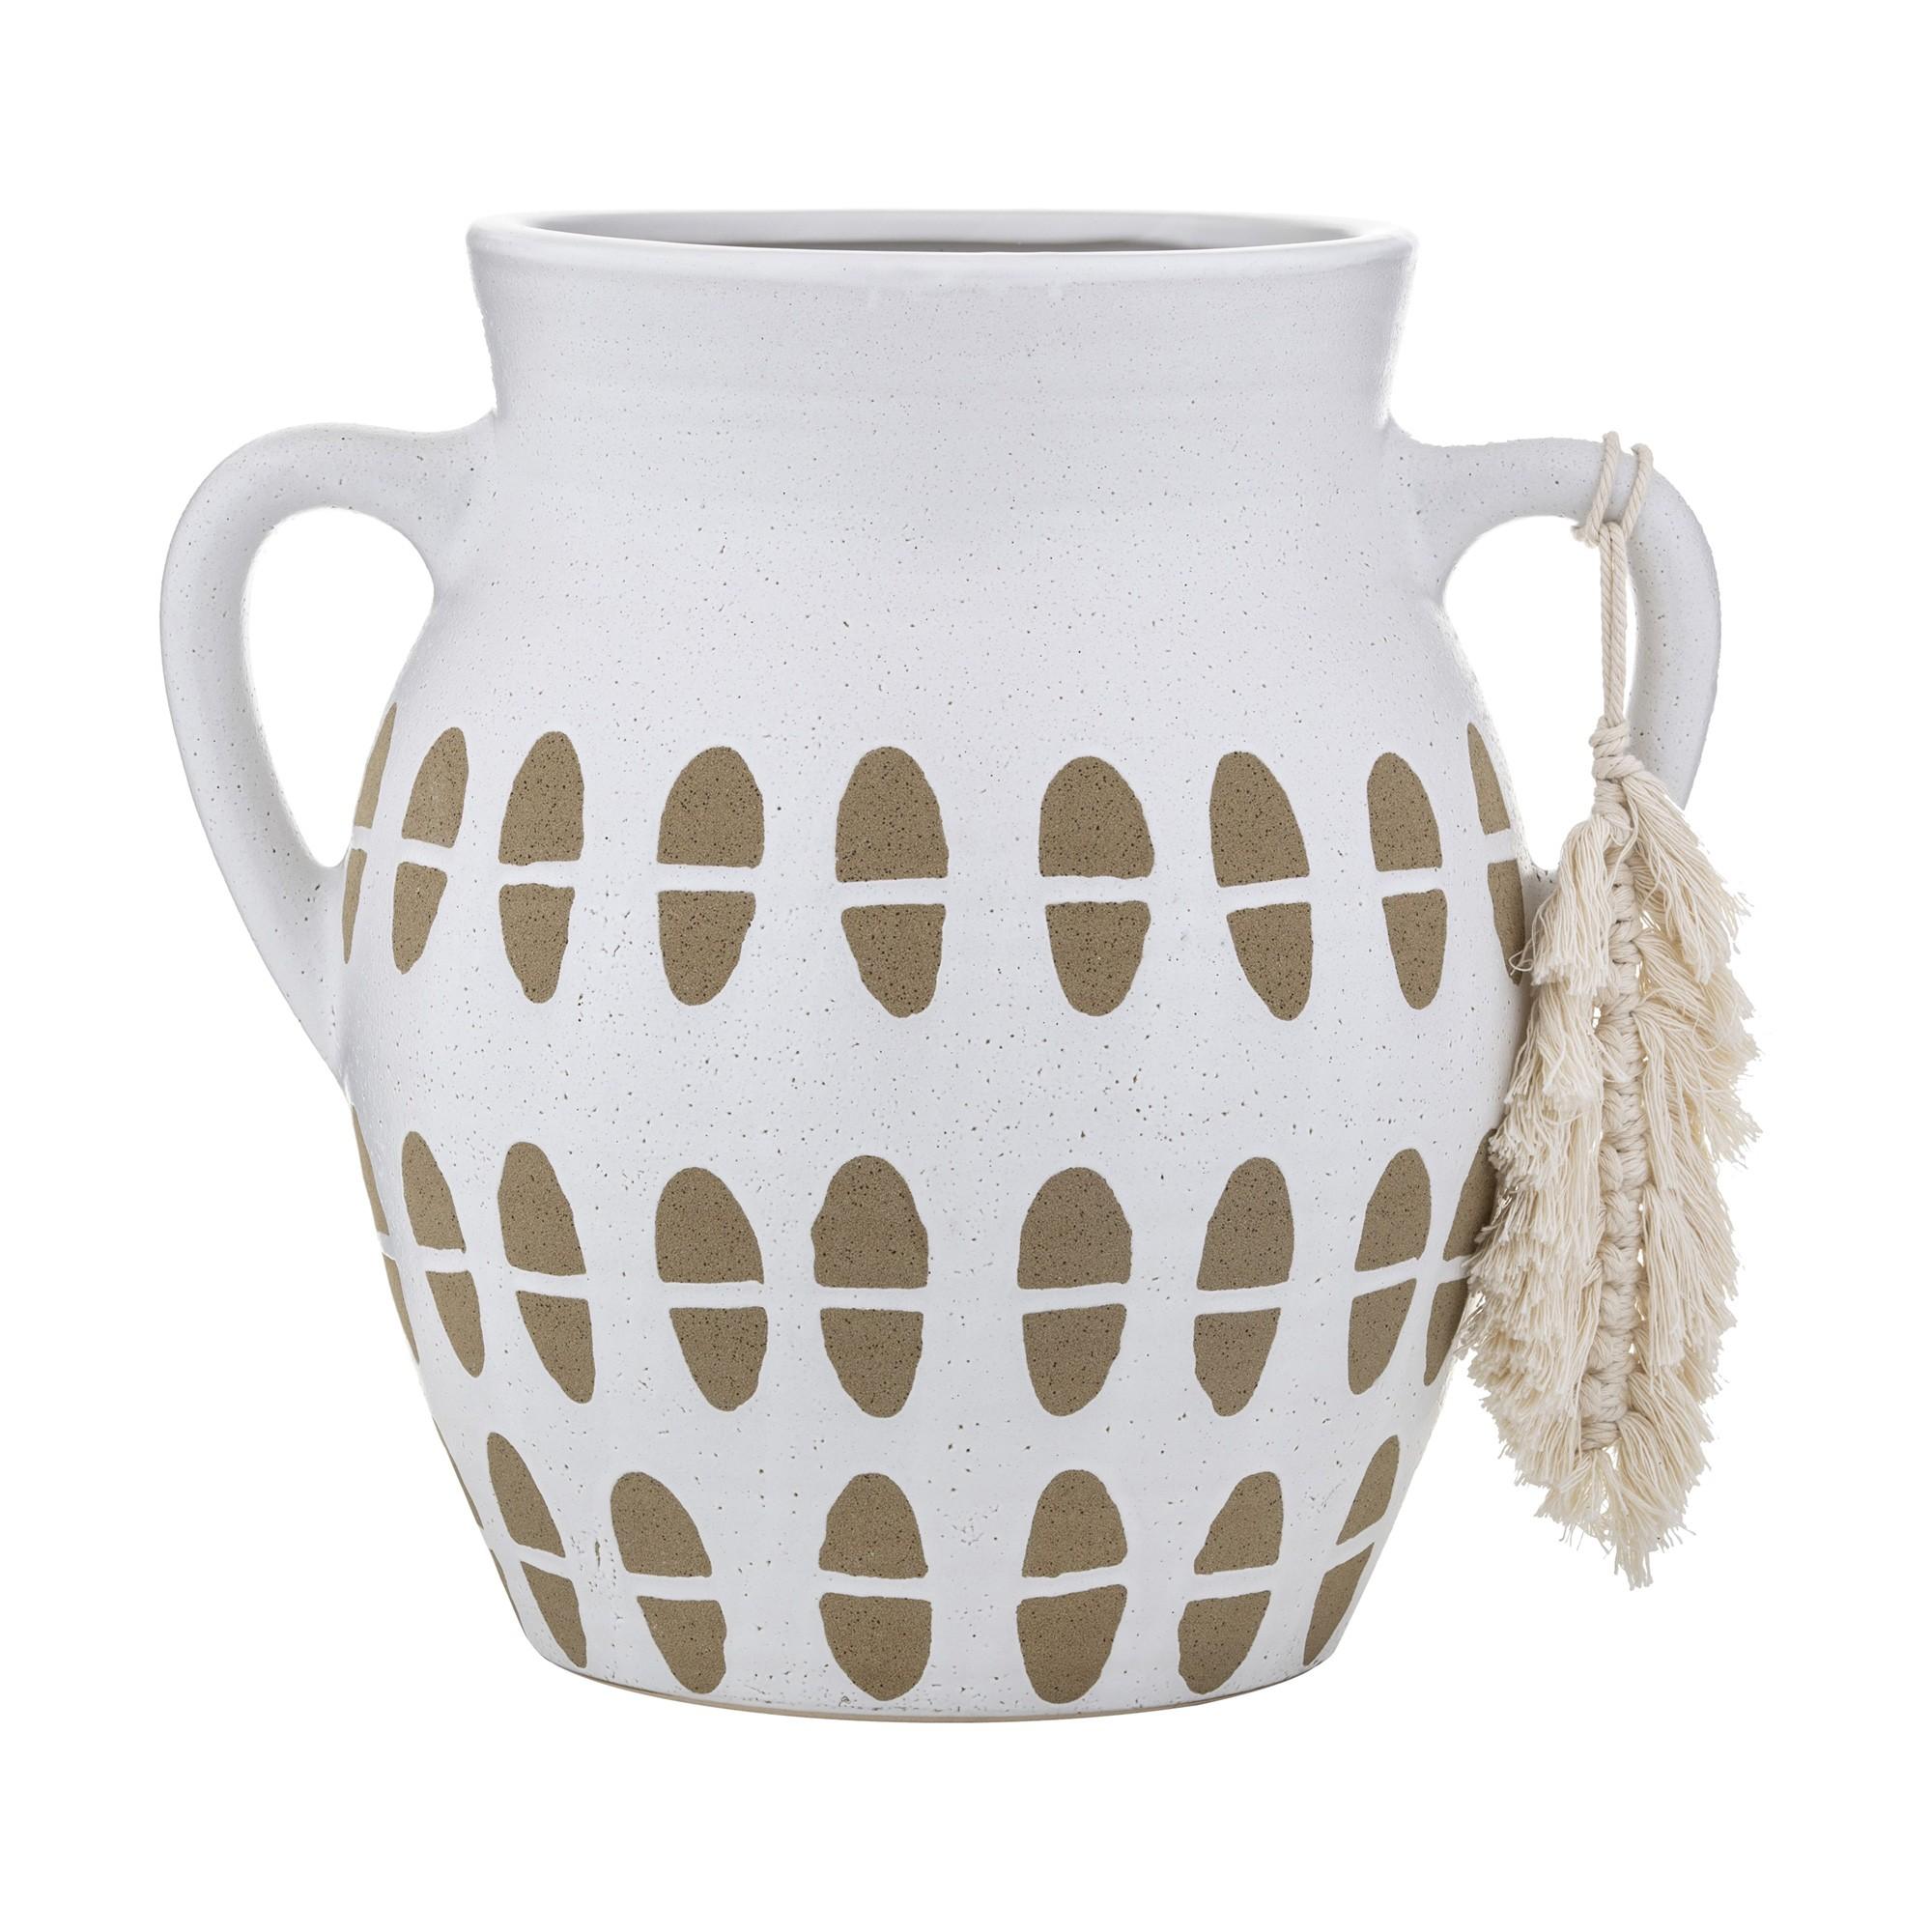 Neso Ceramic Vessel, Large